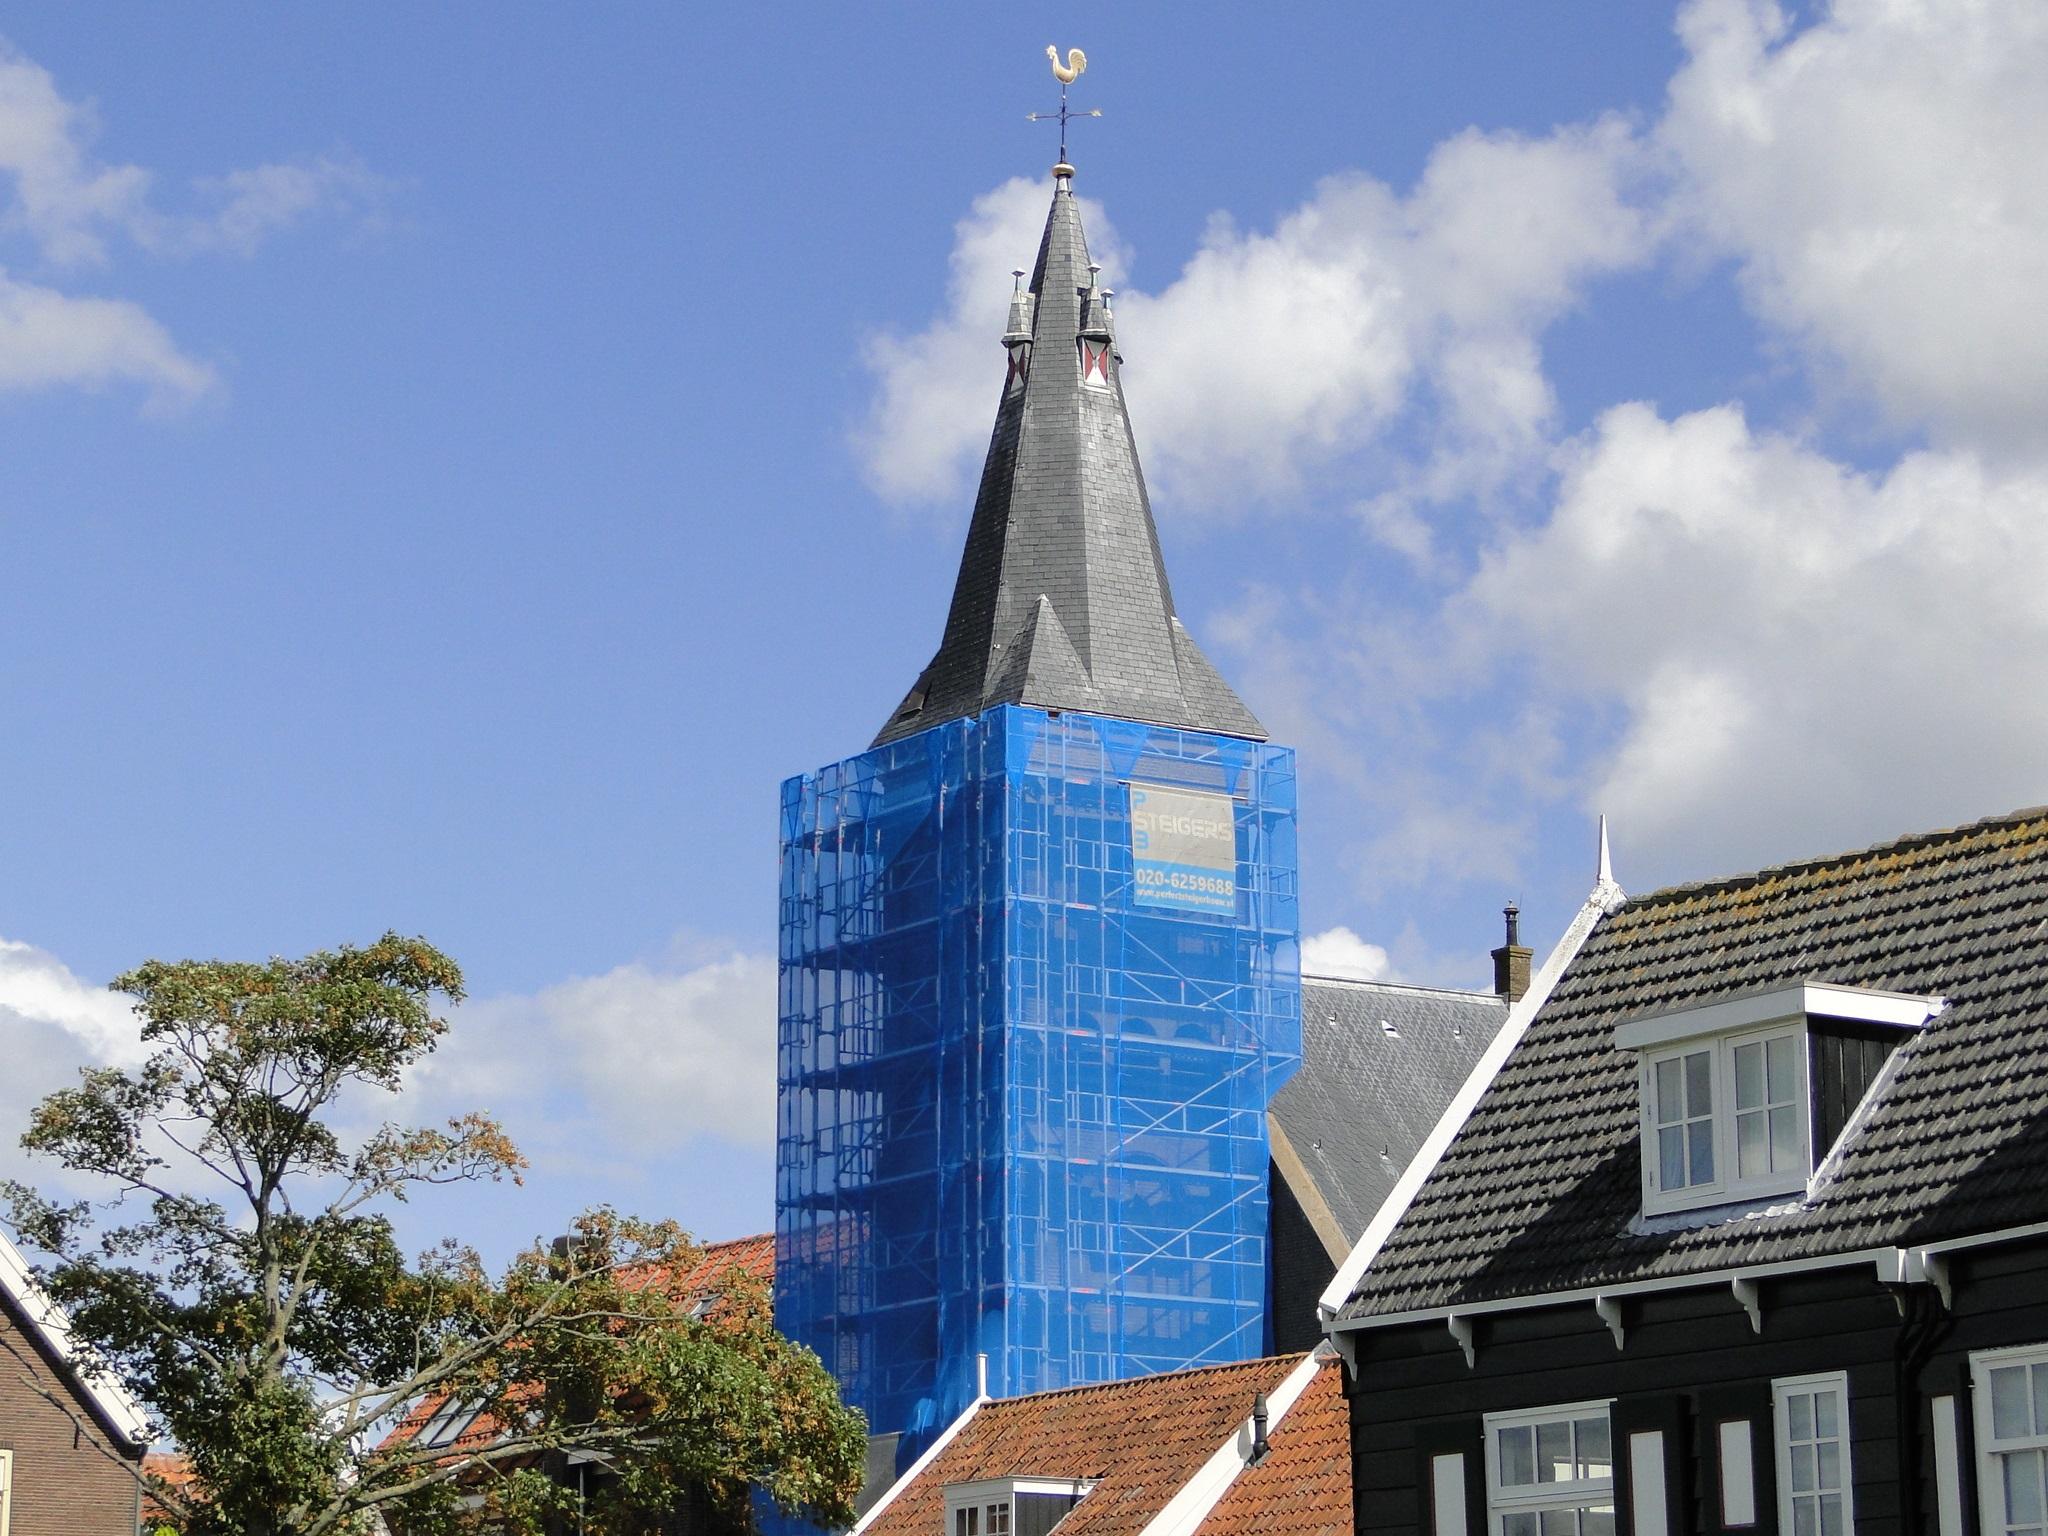 Grote kerk op Marken in de steigers